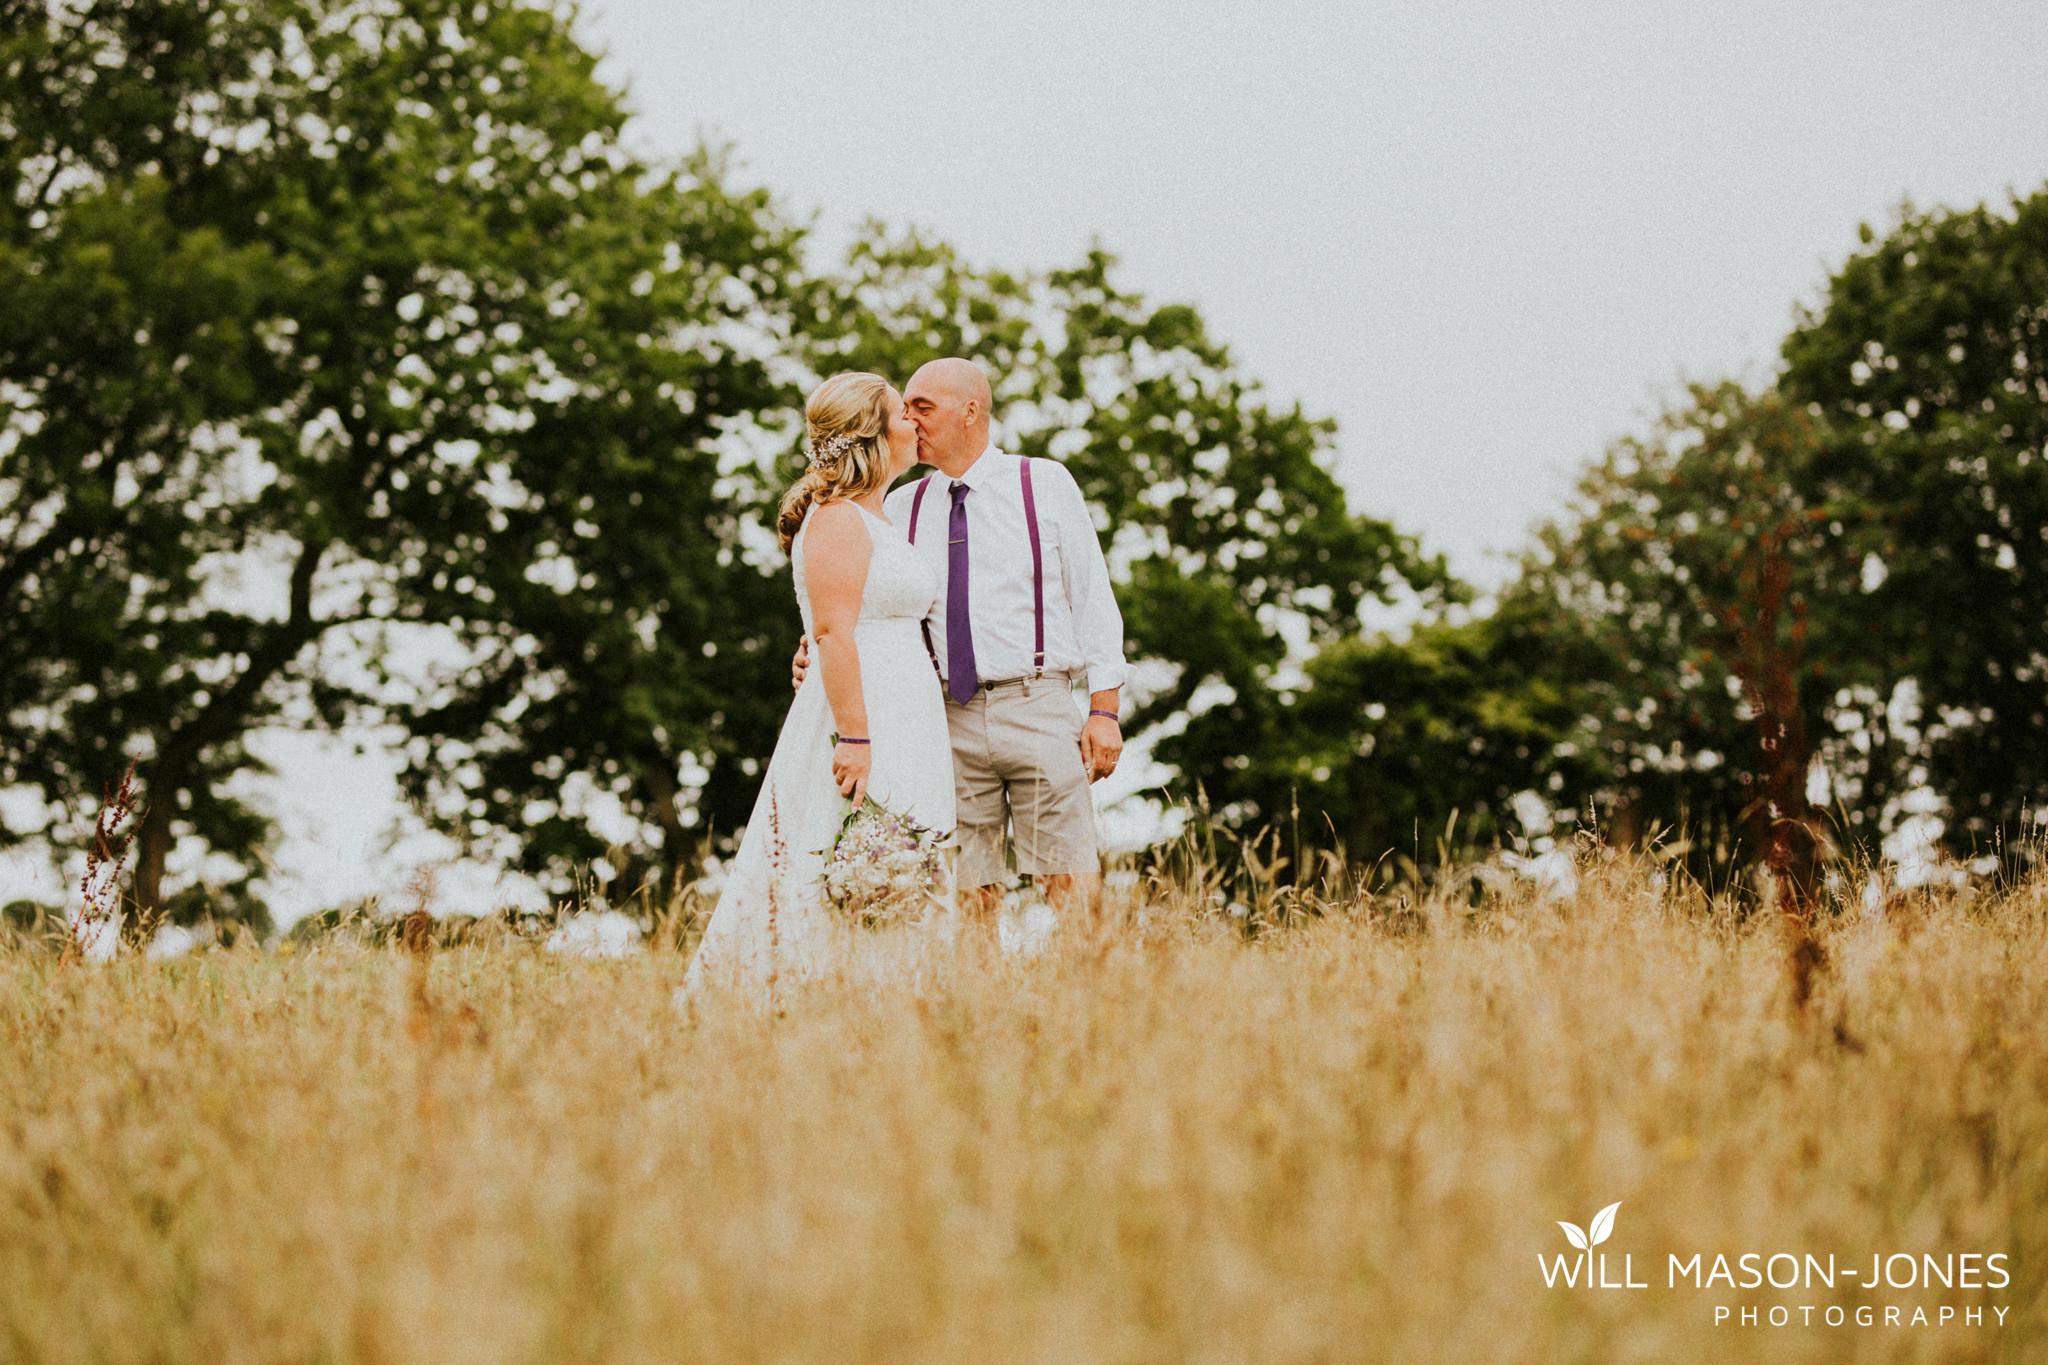 homemade-DIY-festival-alernative-wedding-wales-photographer-5.jpg